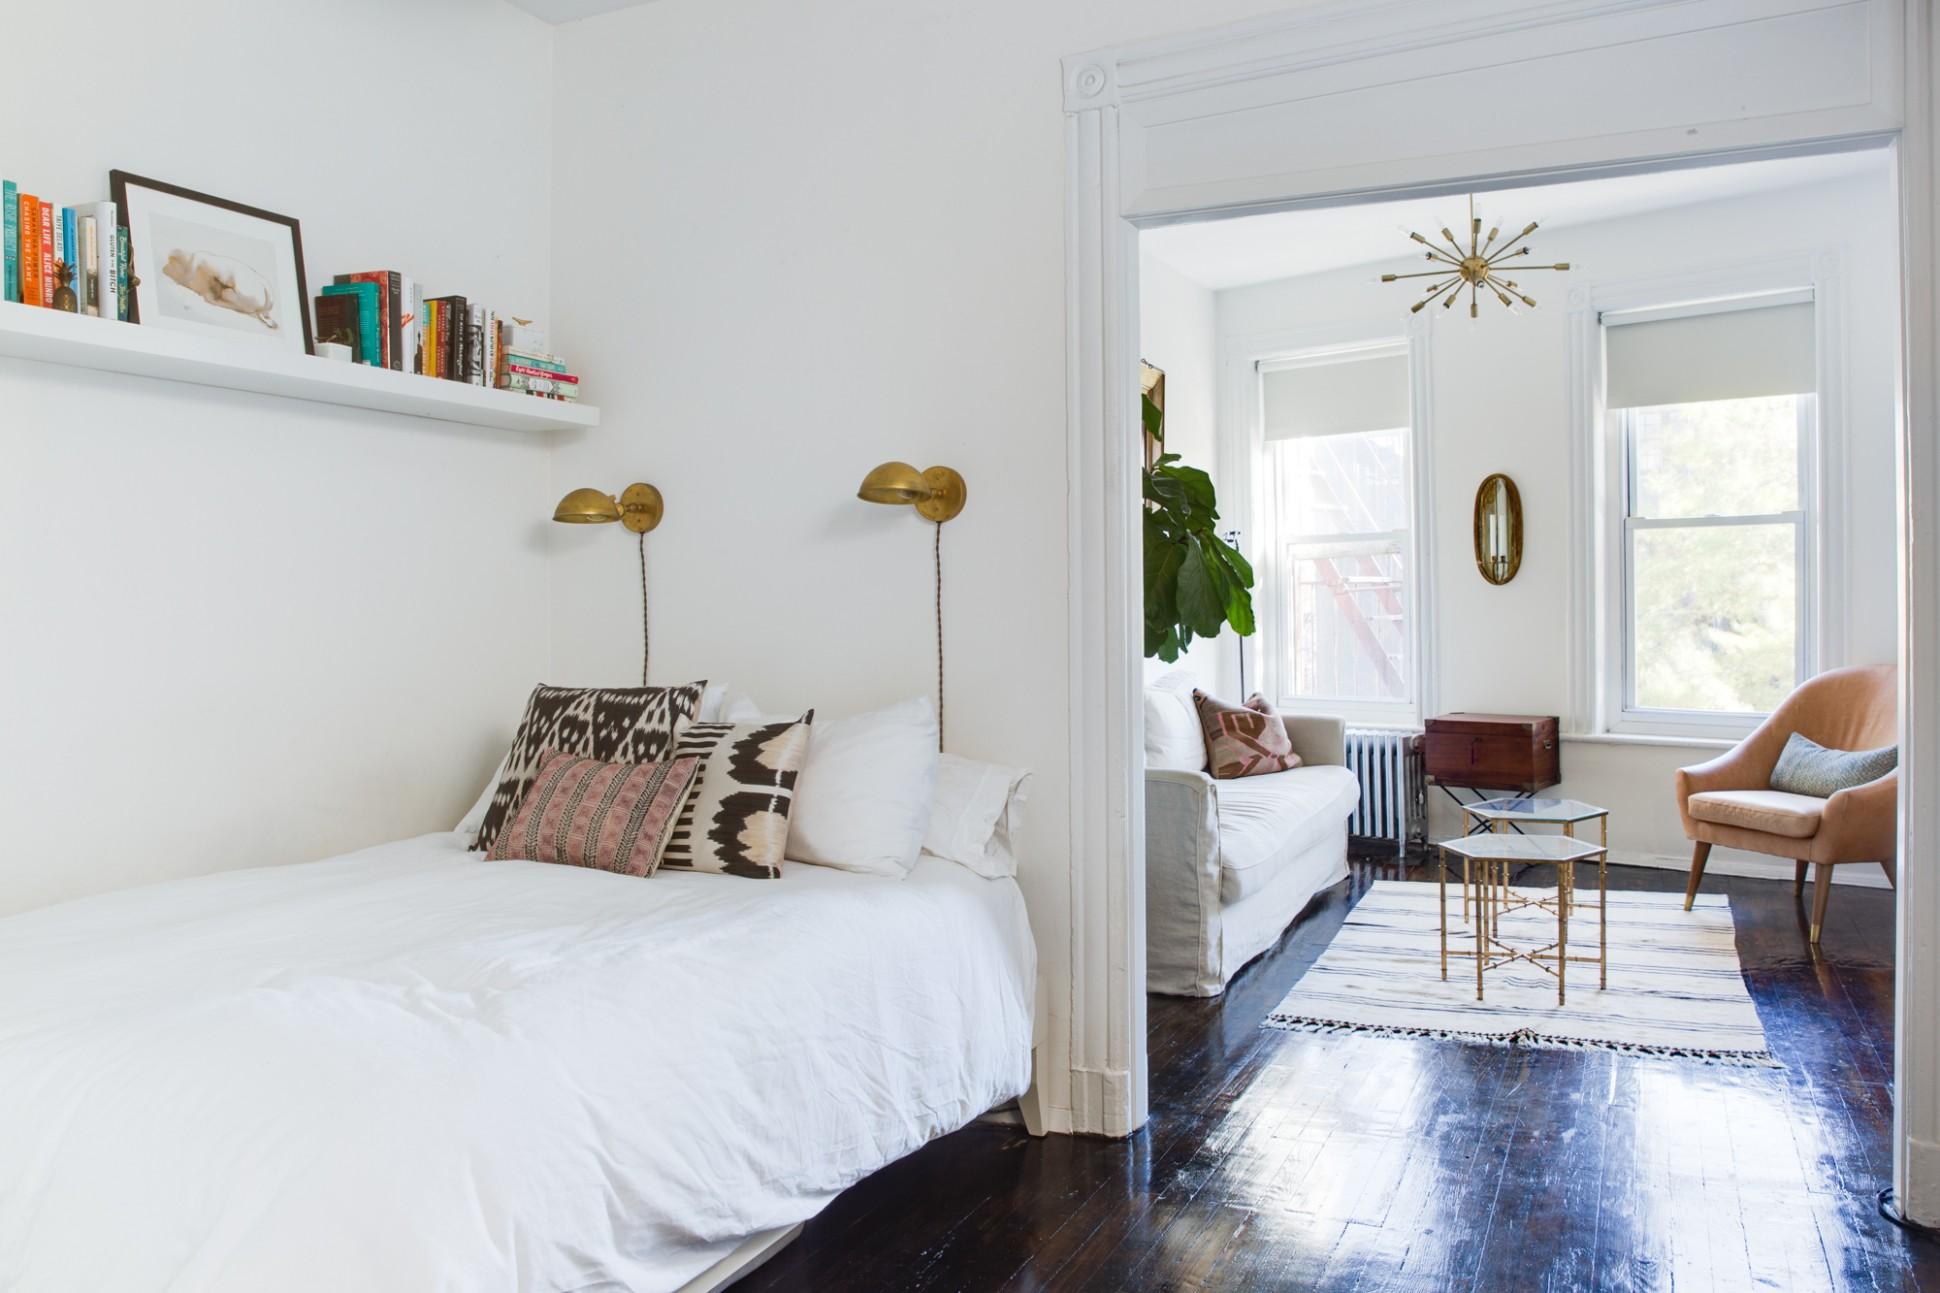 12 Stylish Master Bedroom Decorating Ideas  Apartment Therapy - Bedroom Ideas Apartment Therapy